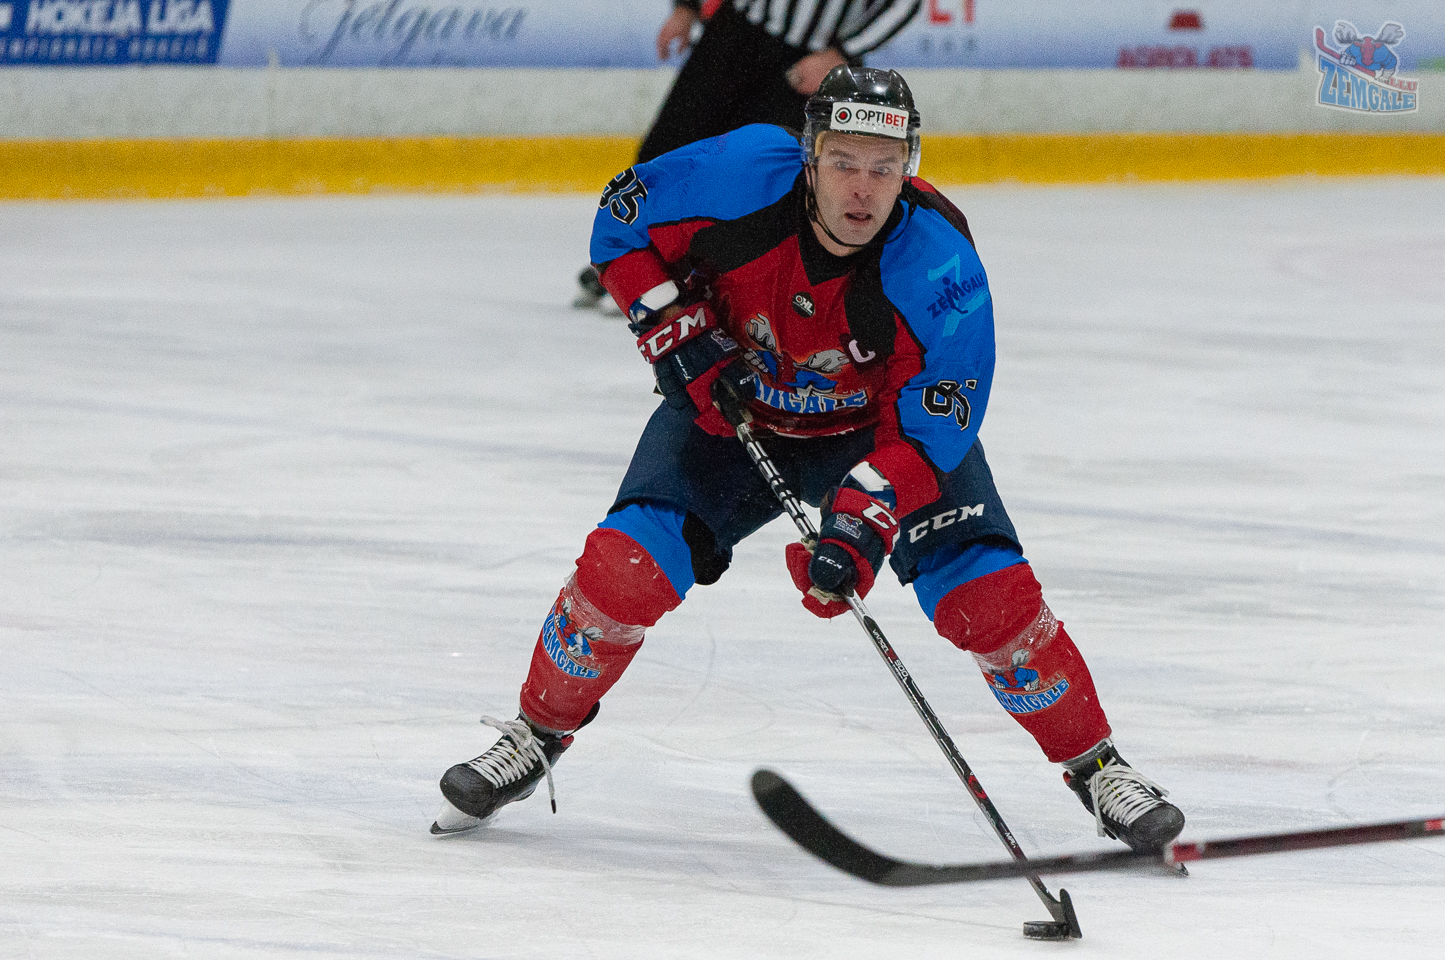 Hokeja uzbrucējs Valentīns Feoktistovs